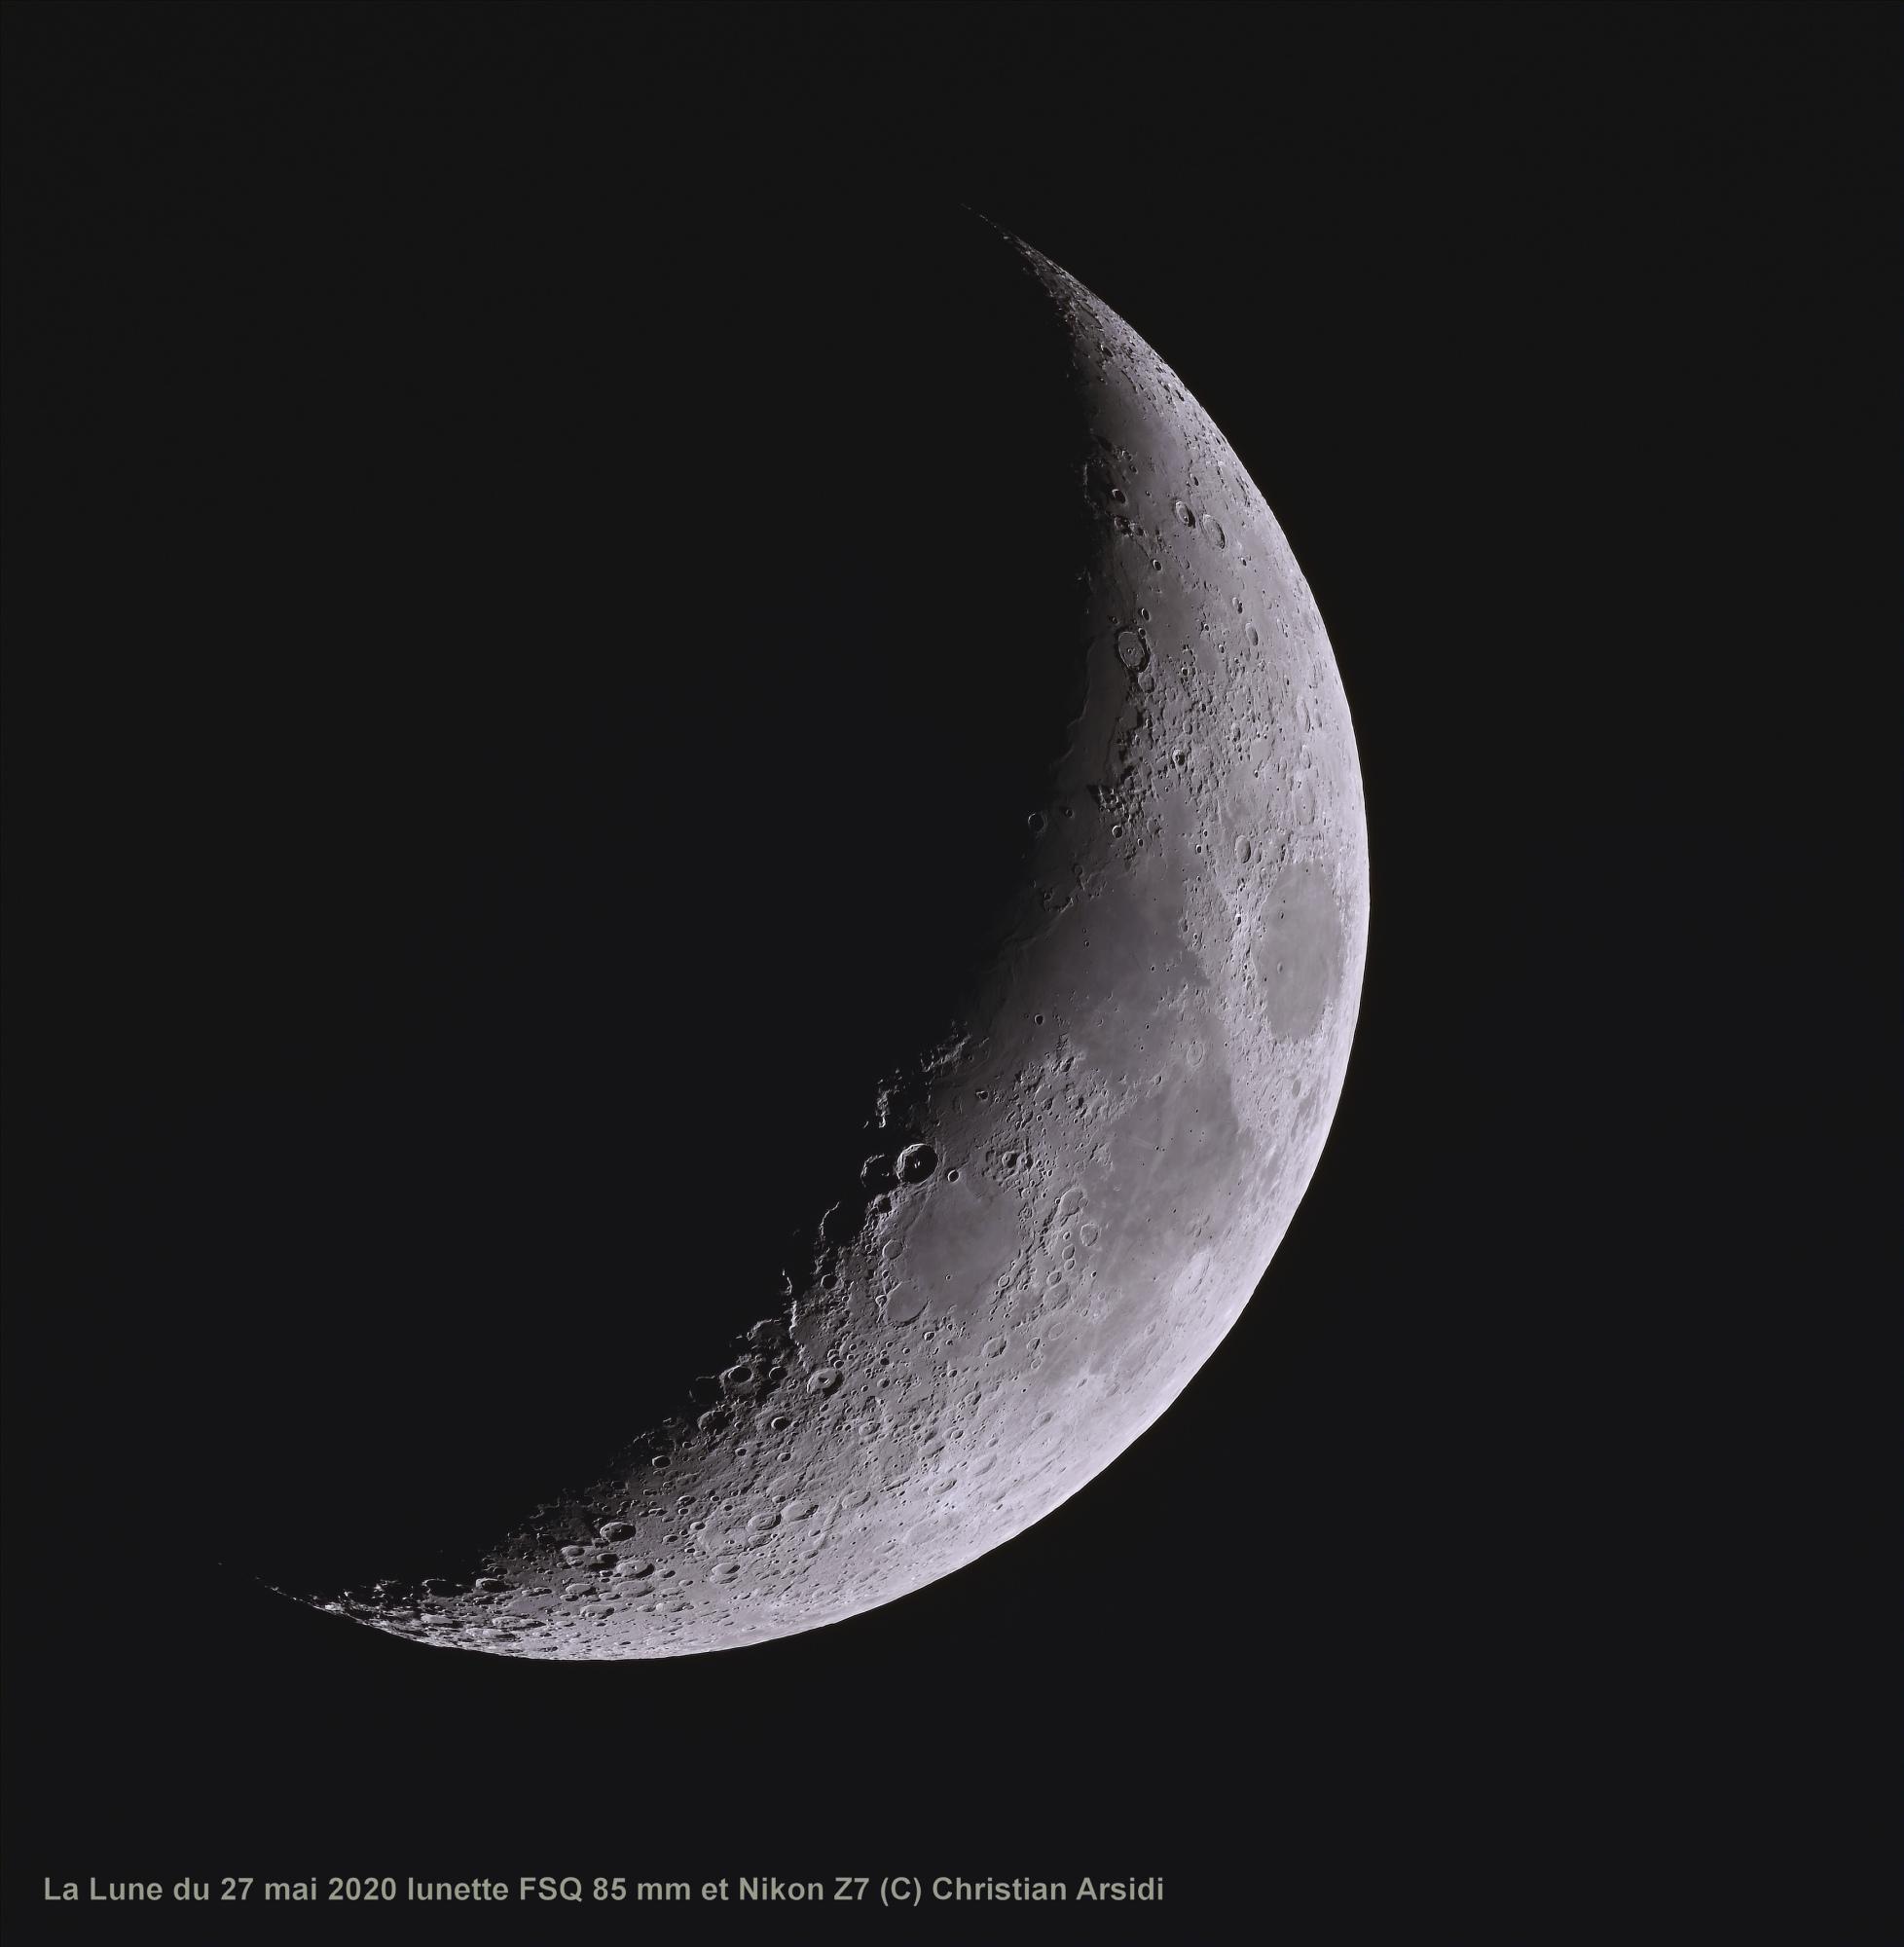 la Lune 20 images TTB BV 90% Jpeg.jpg